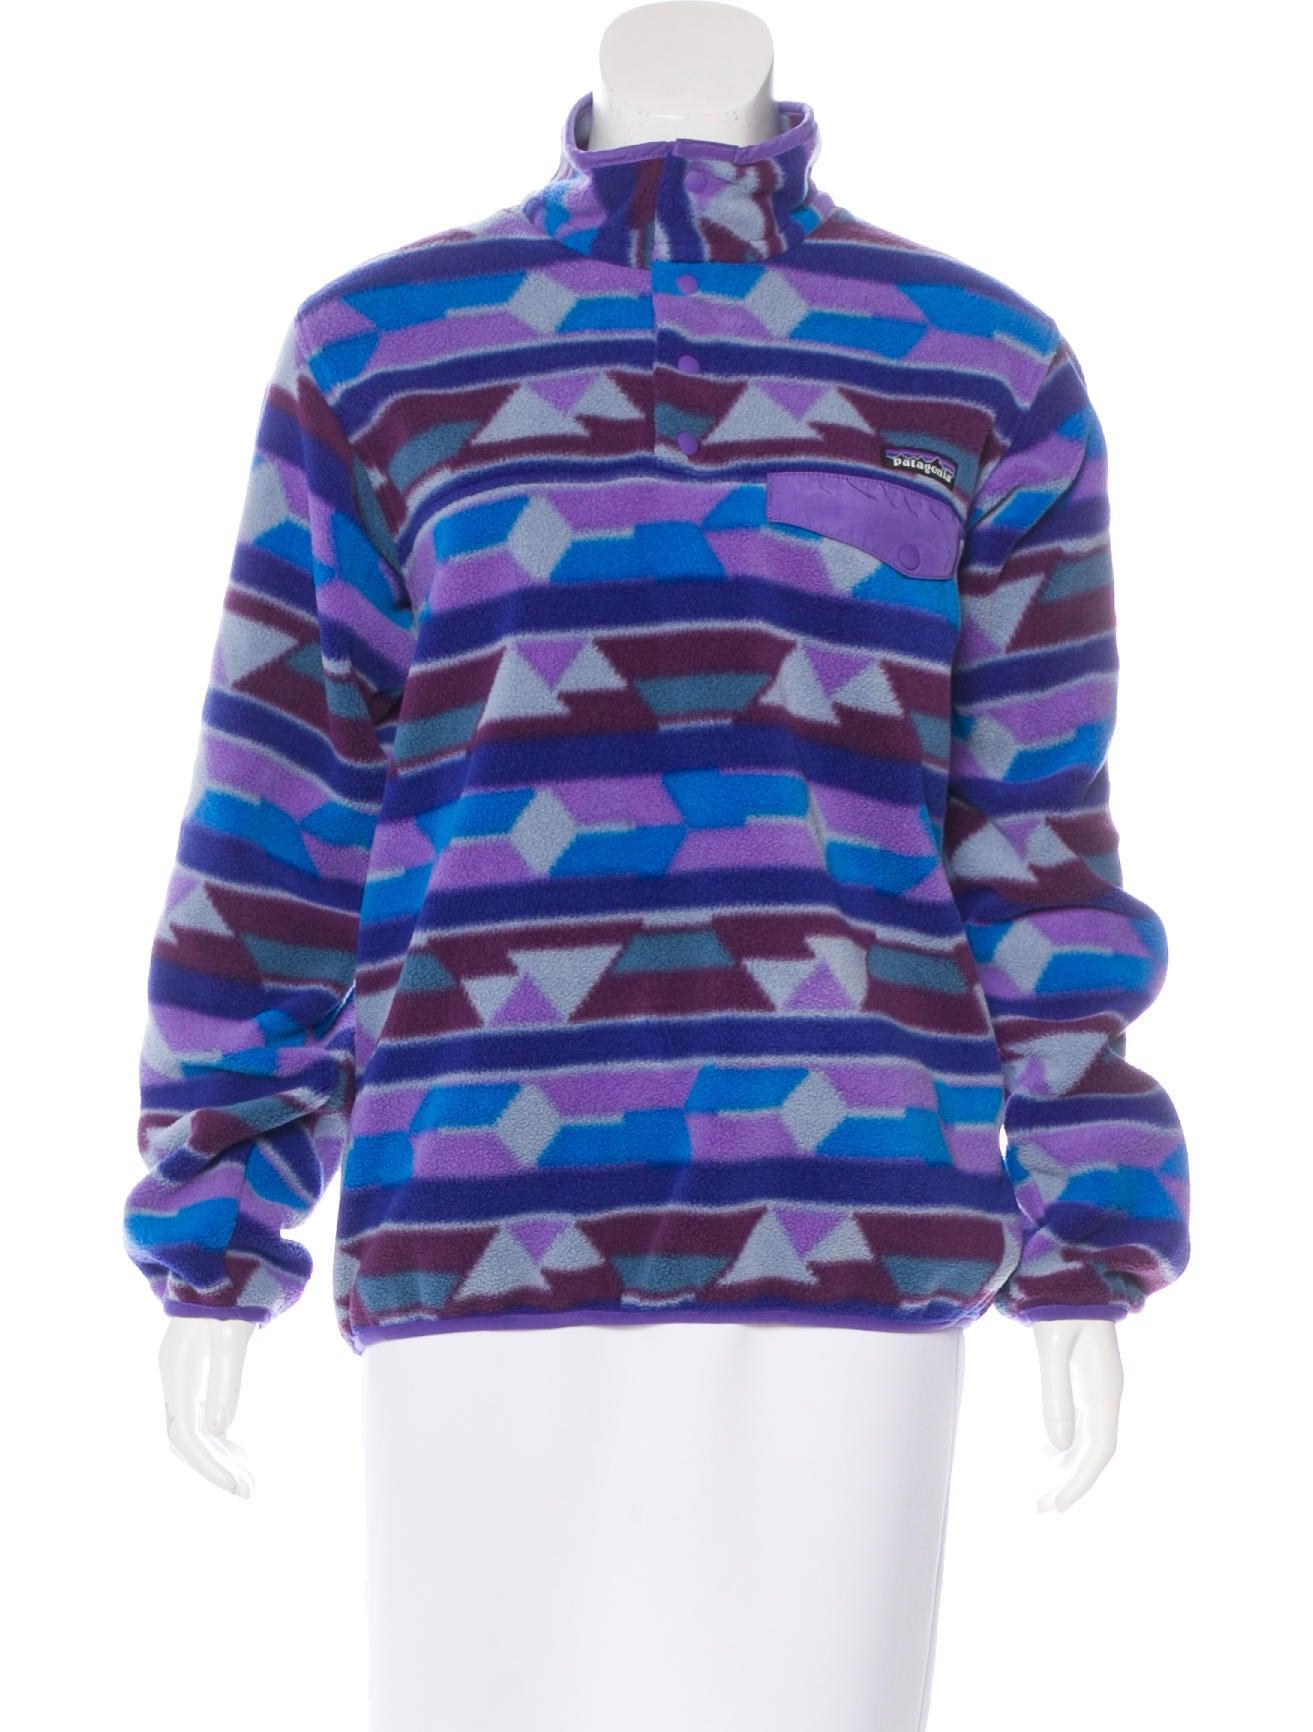 Patagonia Fleece Pullover Sweatshirt Clothing